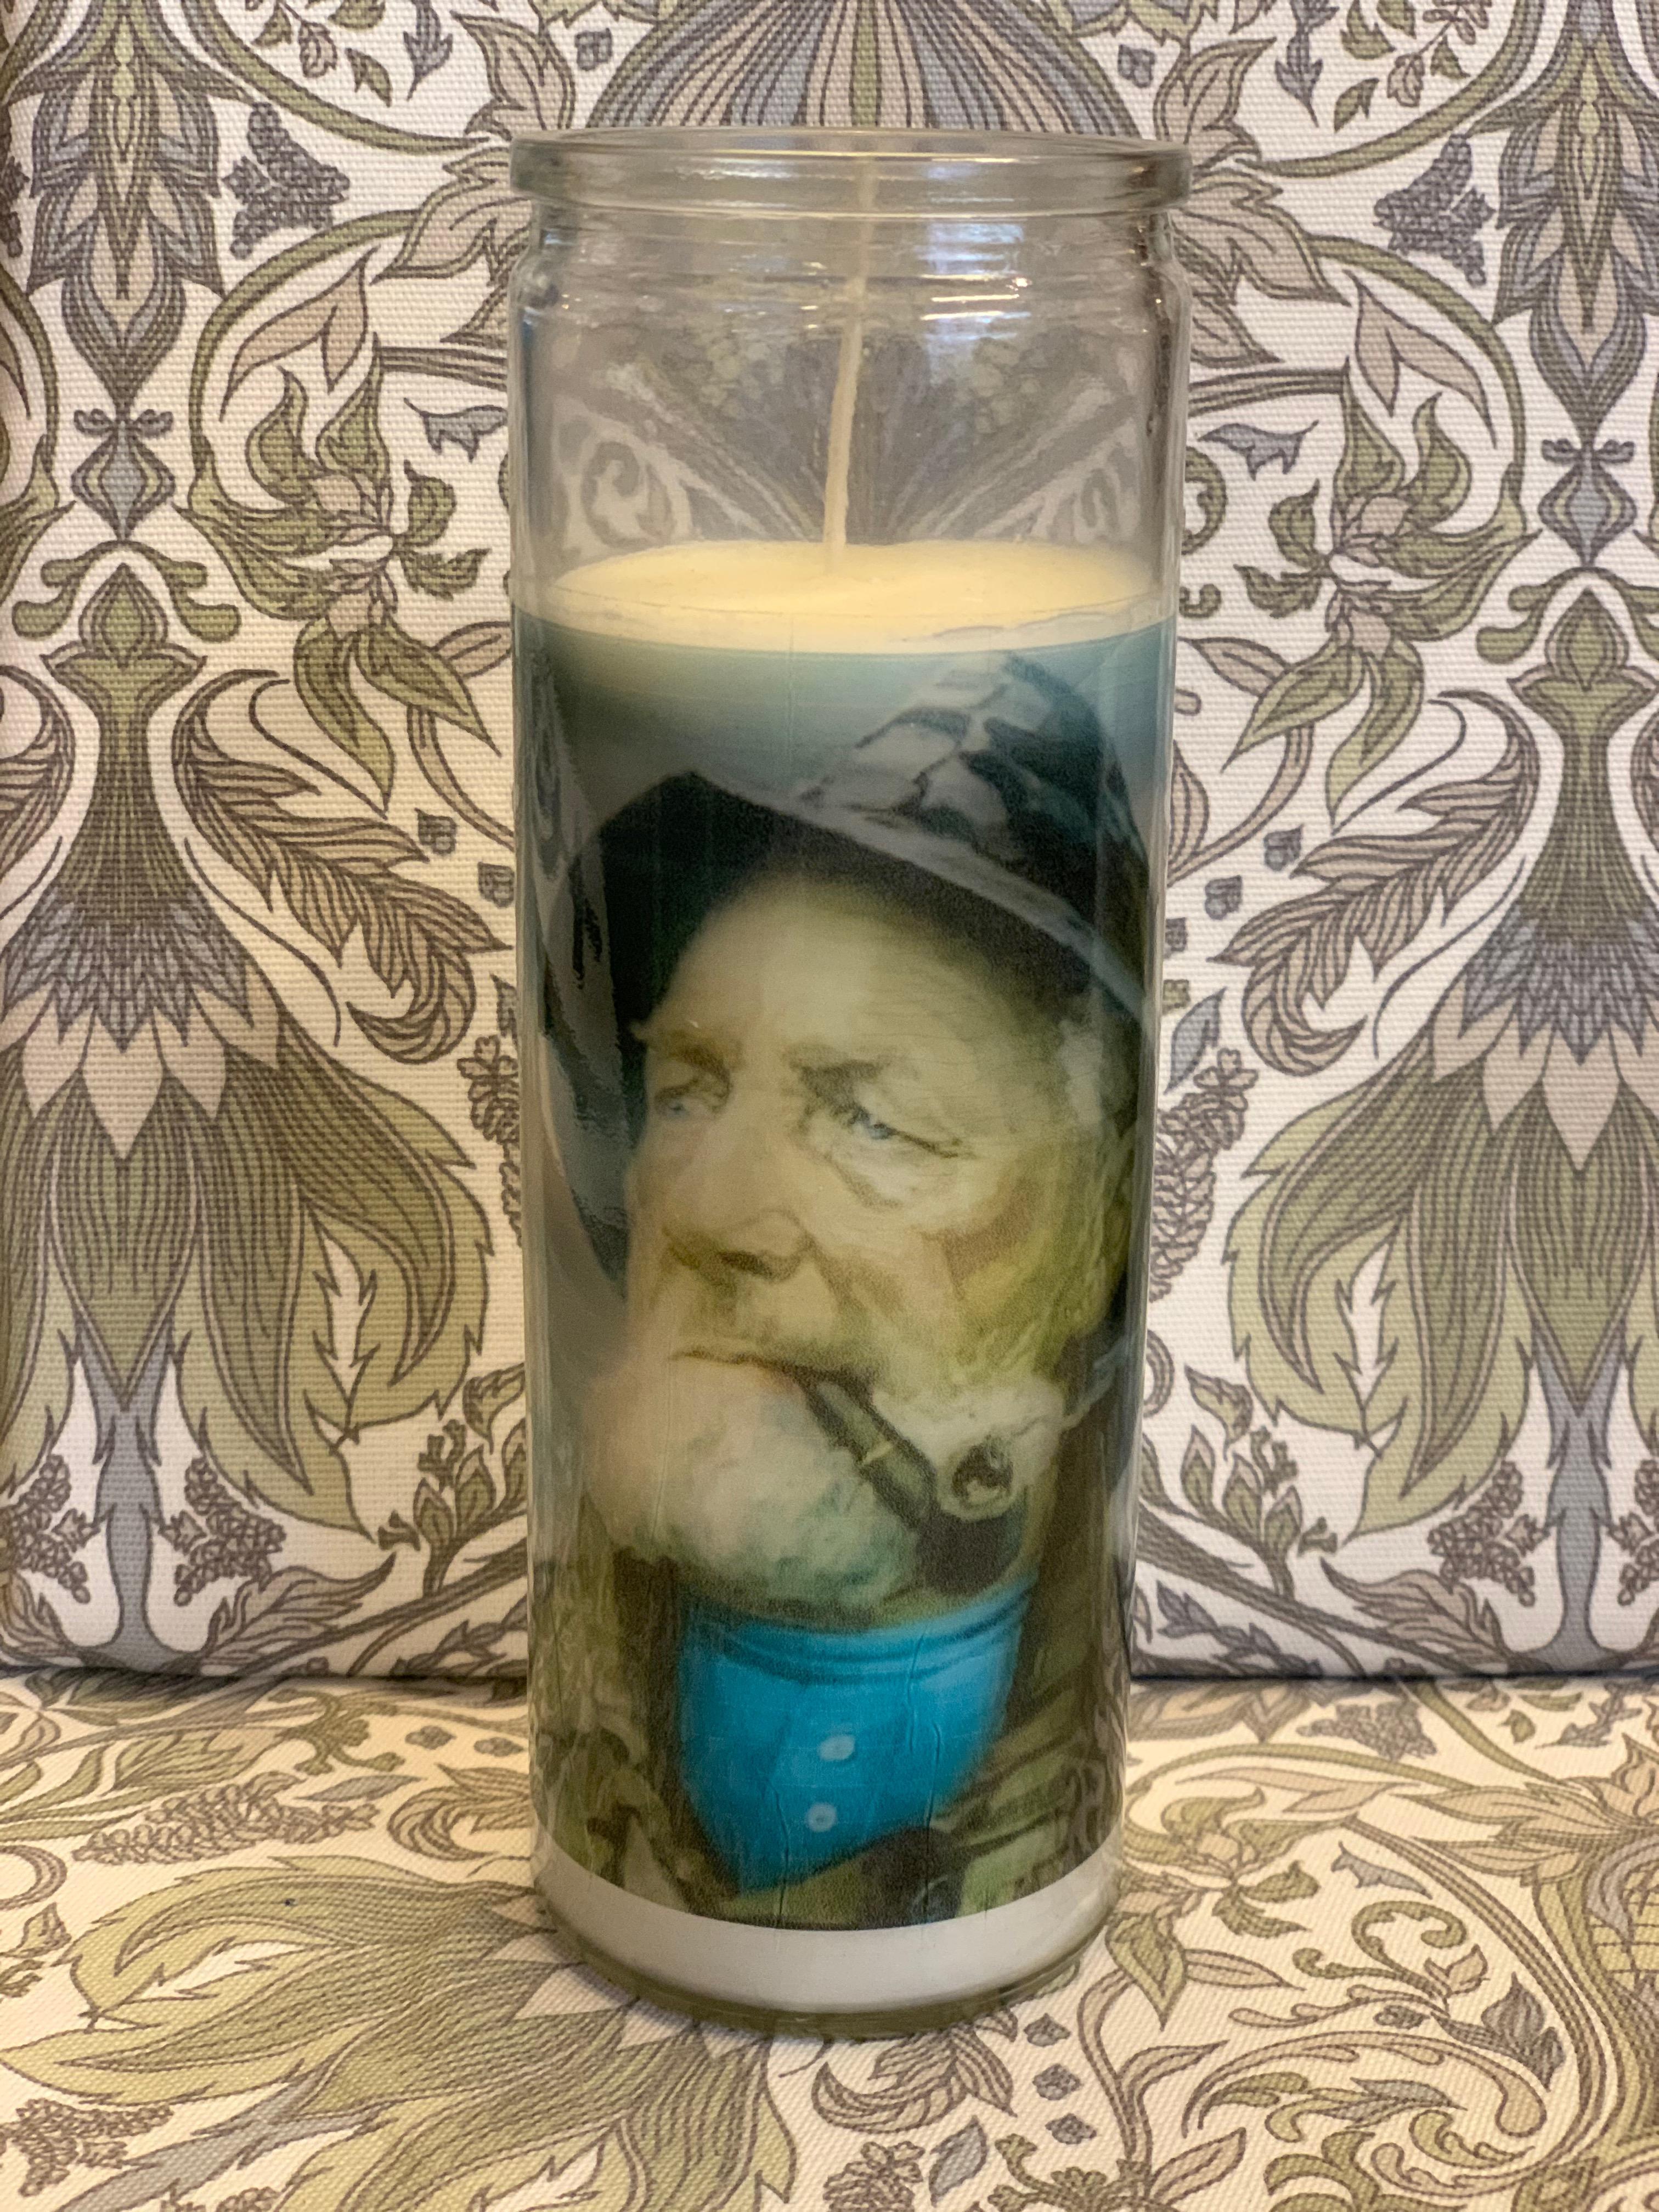 Ljus i Glas - Fiskargubben